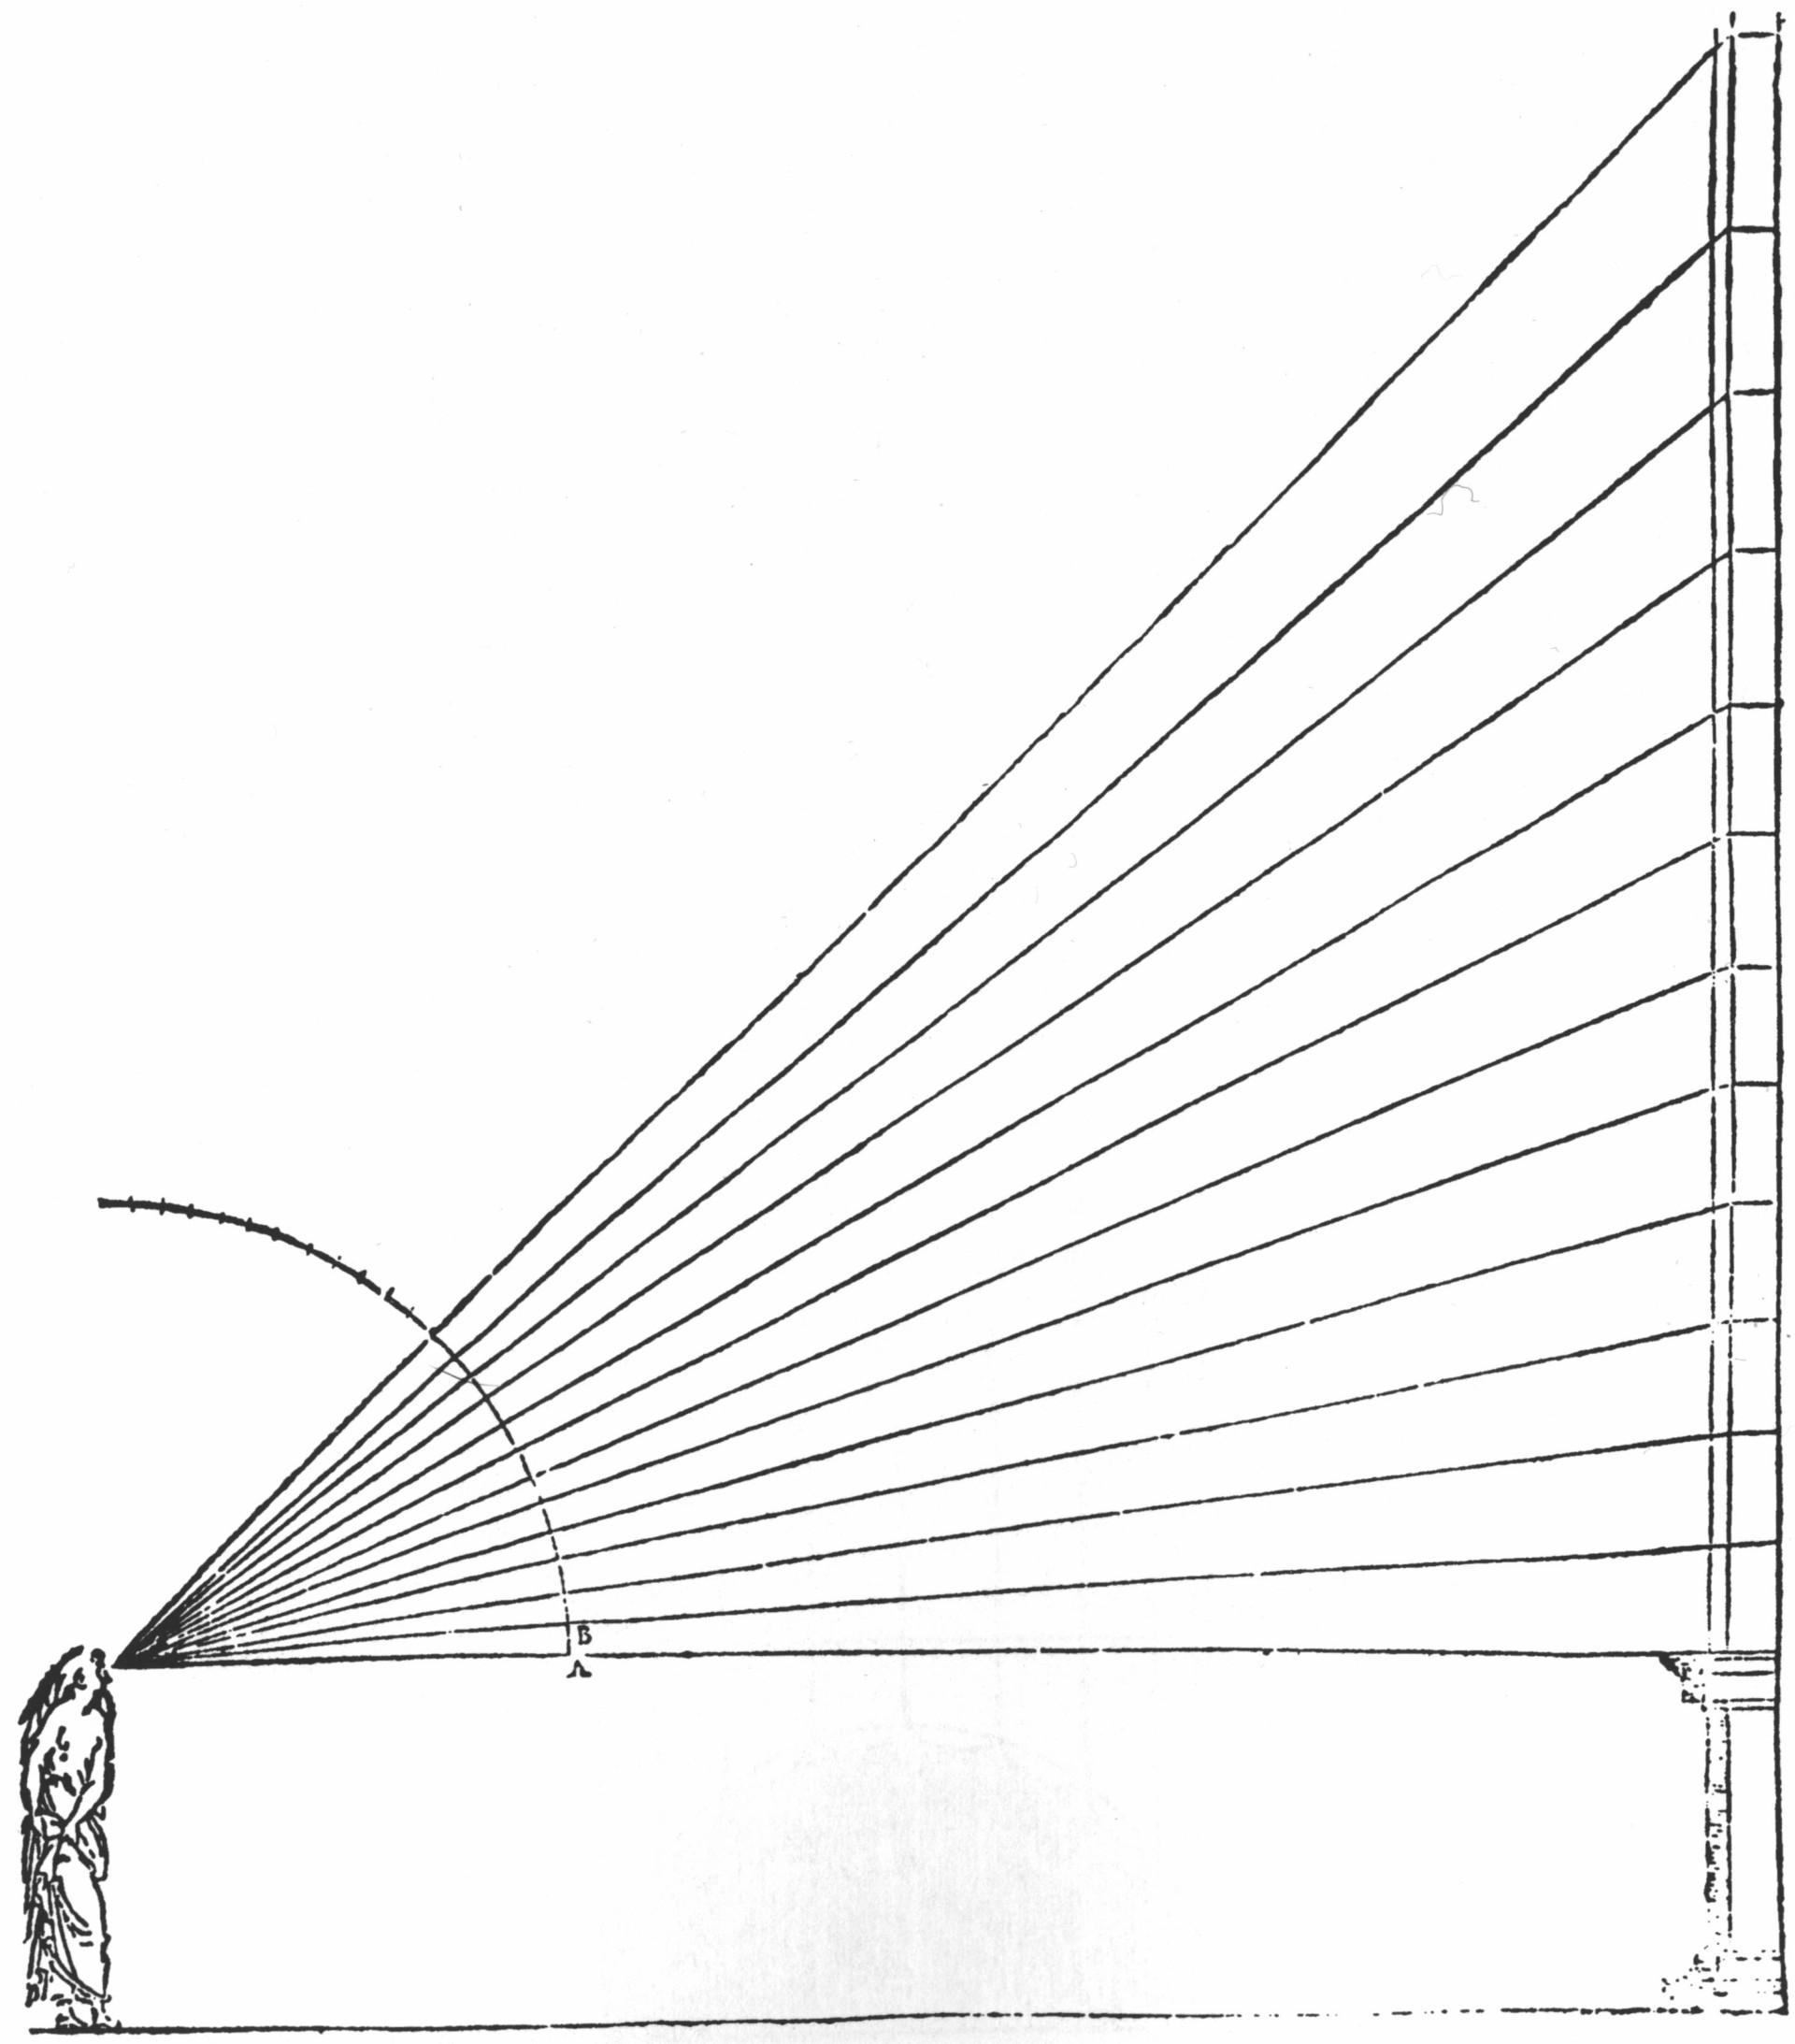 THE BREAKDOWN OF THE PROMENADE: image 17